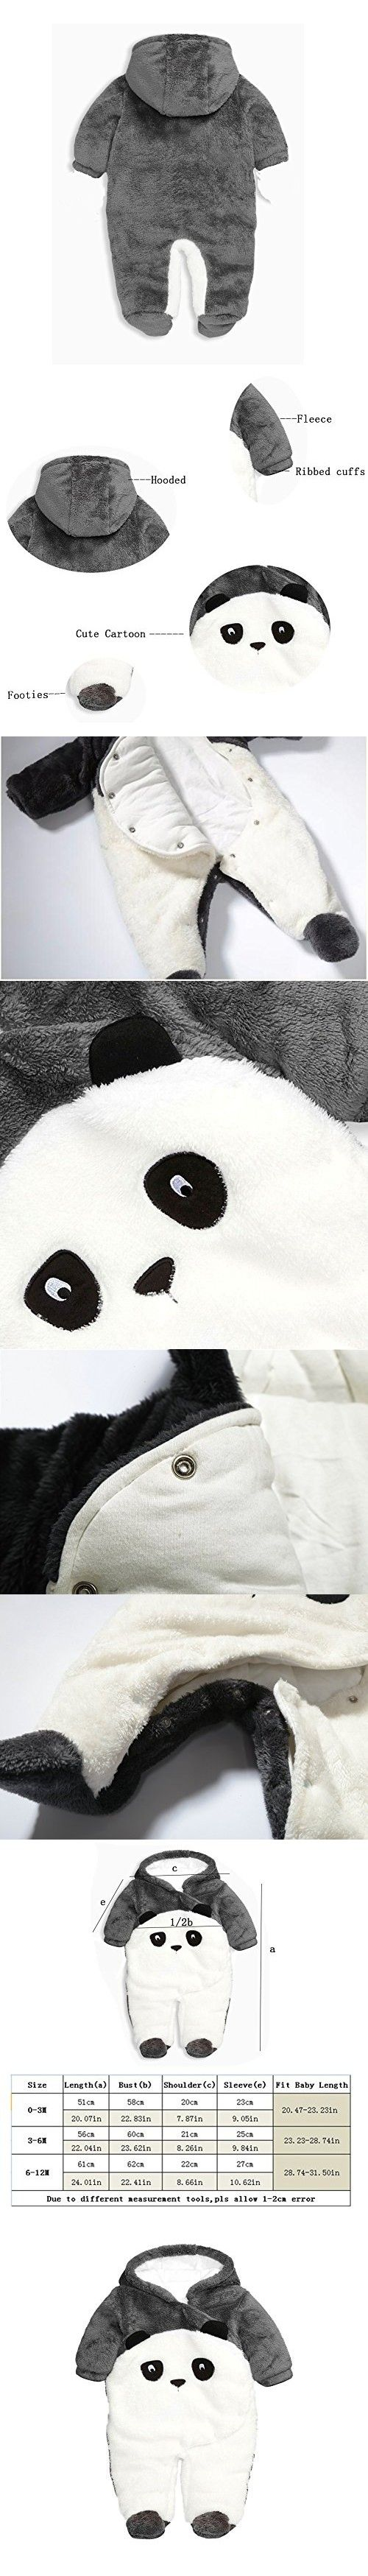 Fairy Baby Unisex Baby Winter Flannel Panda Outfits Onesie Romper,6-12M